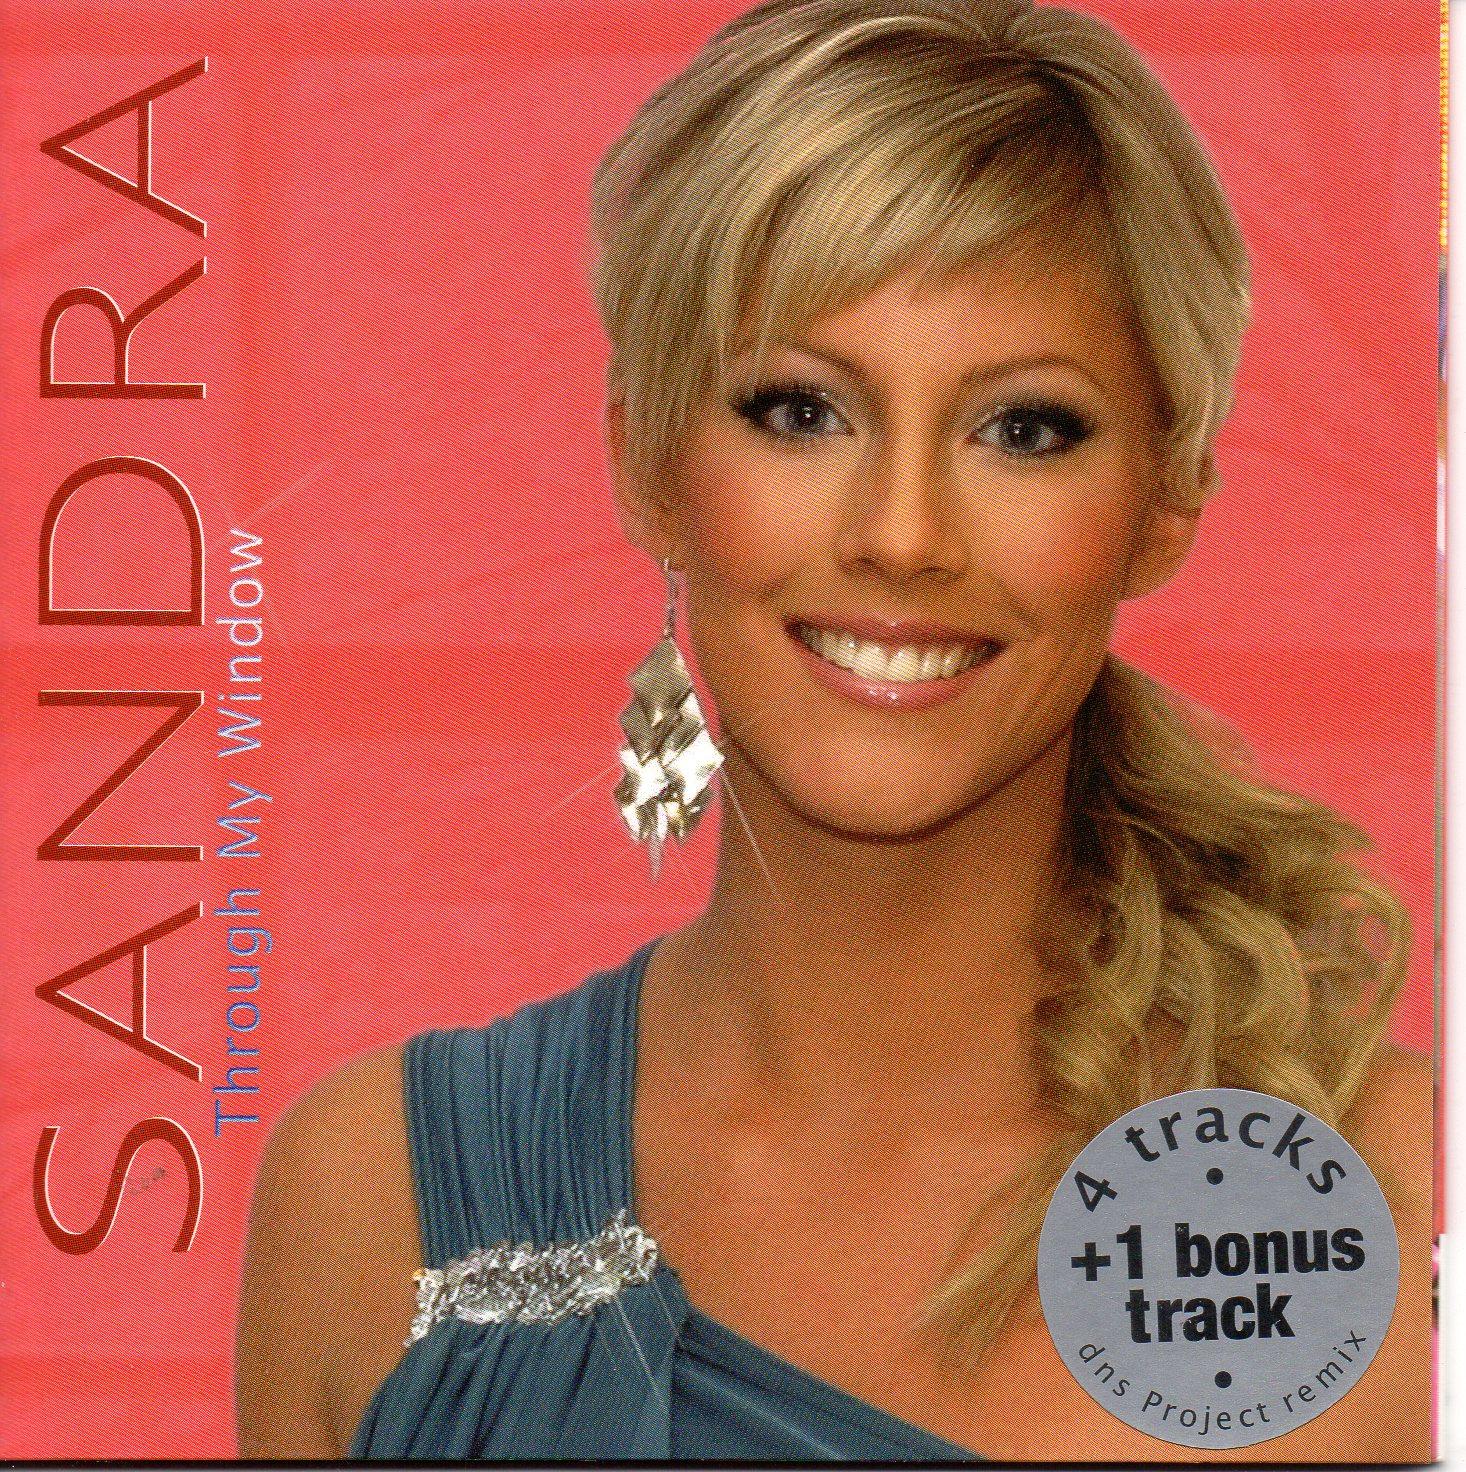 EUROVISION 2006 ESTONIE : SANDRA OXENRYD - Through the window 5-track CARD SLEEVE - CD single